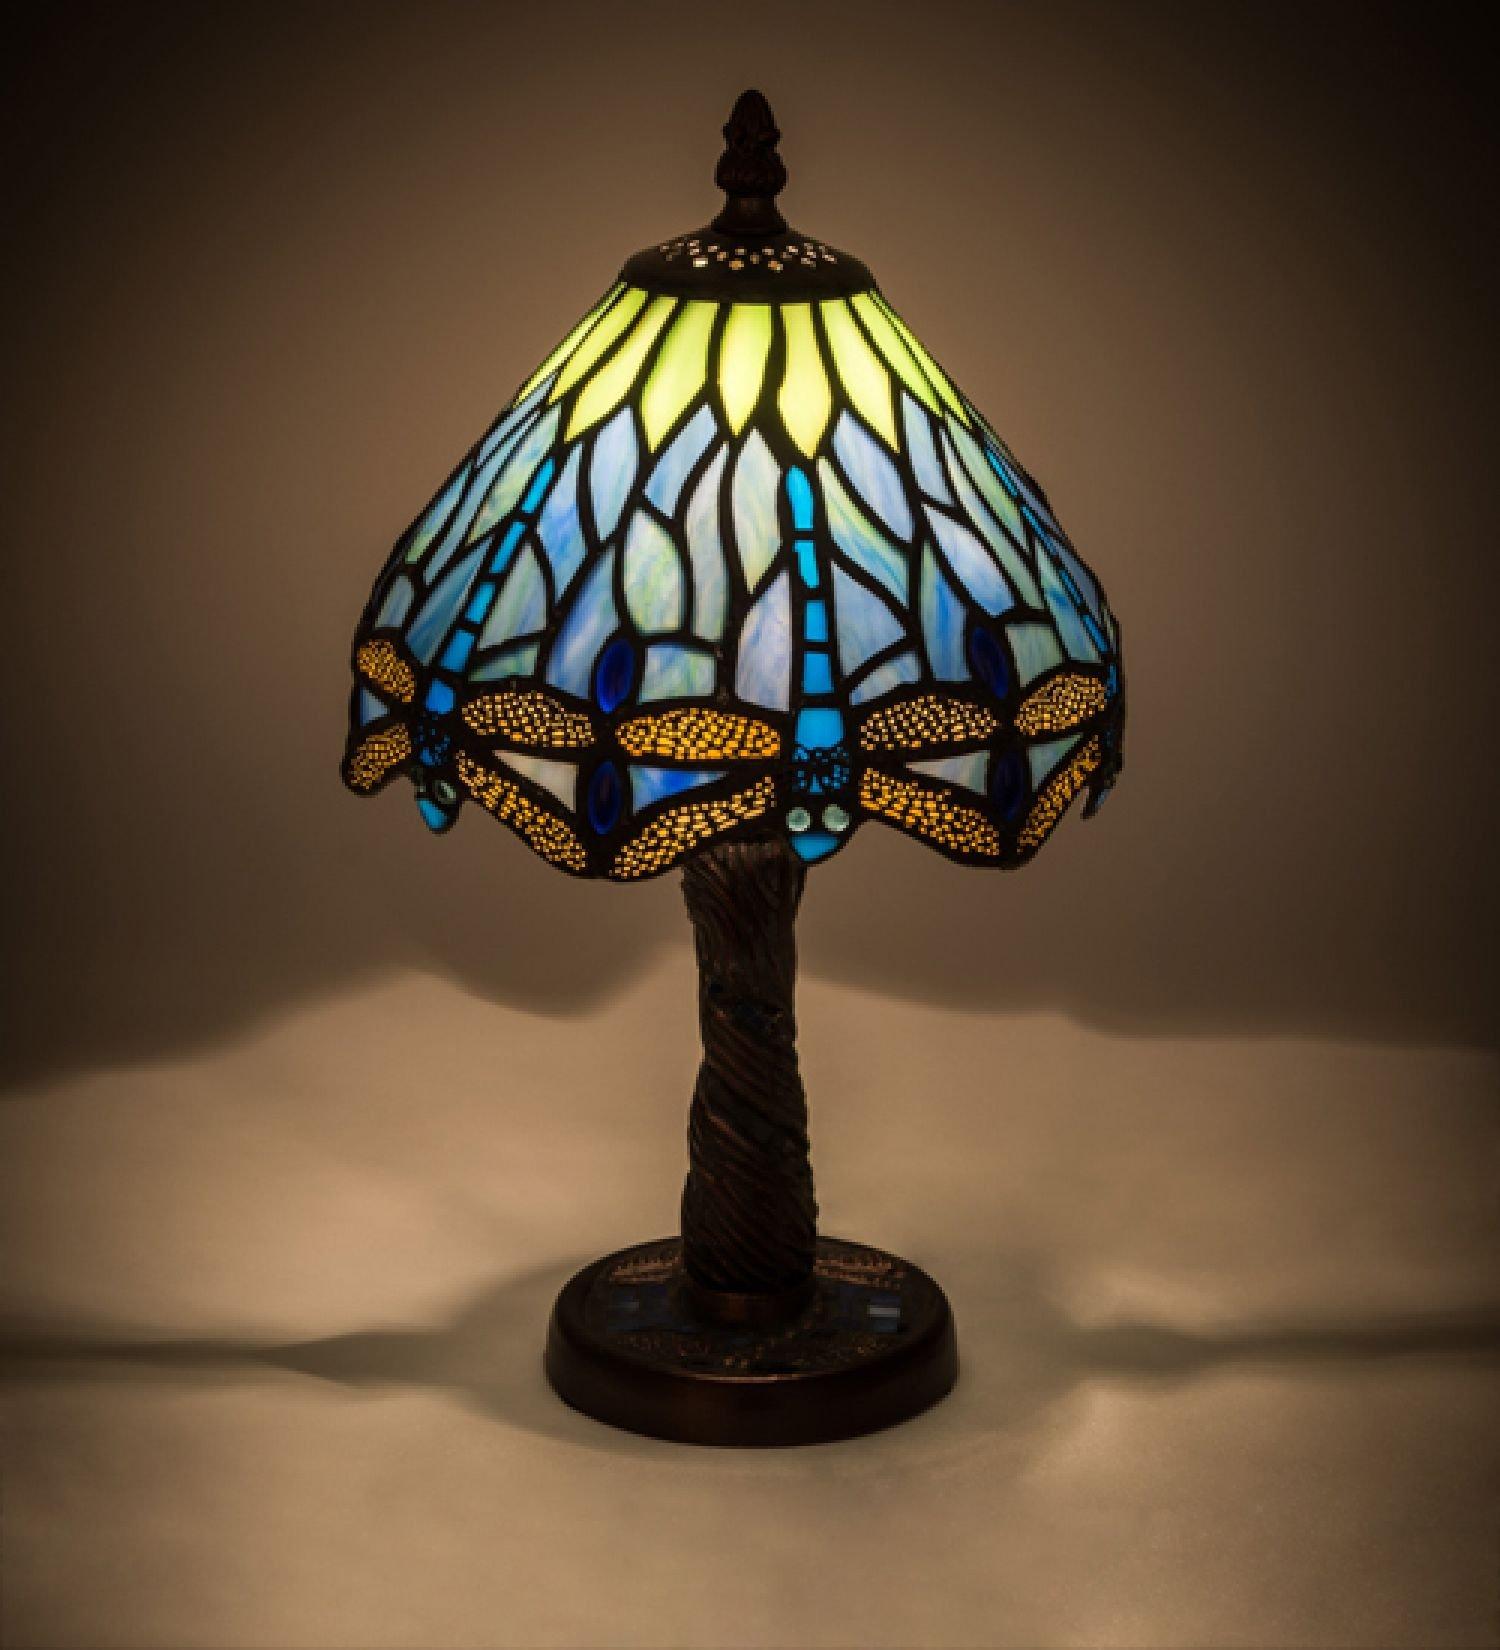 StarSun Depot 12'' H Tiffany Hanginghead Dragonfly W/Mosaic Base Mini Lamp Damp